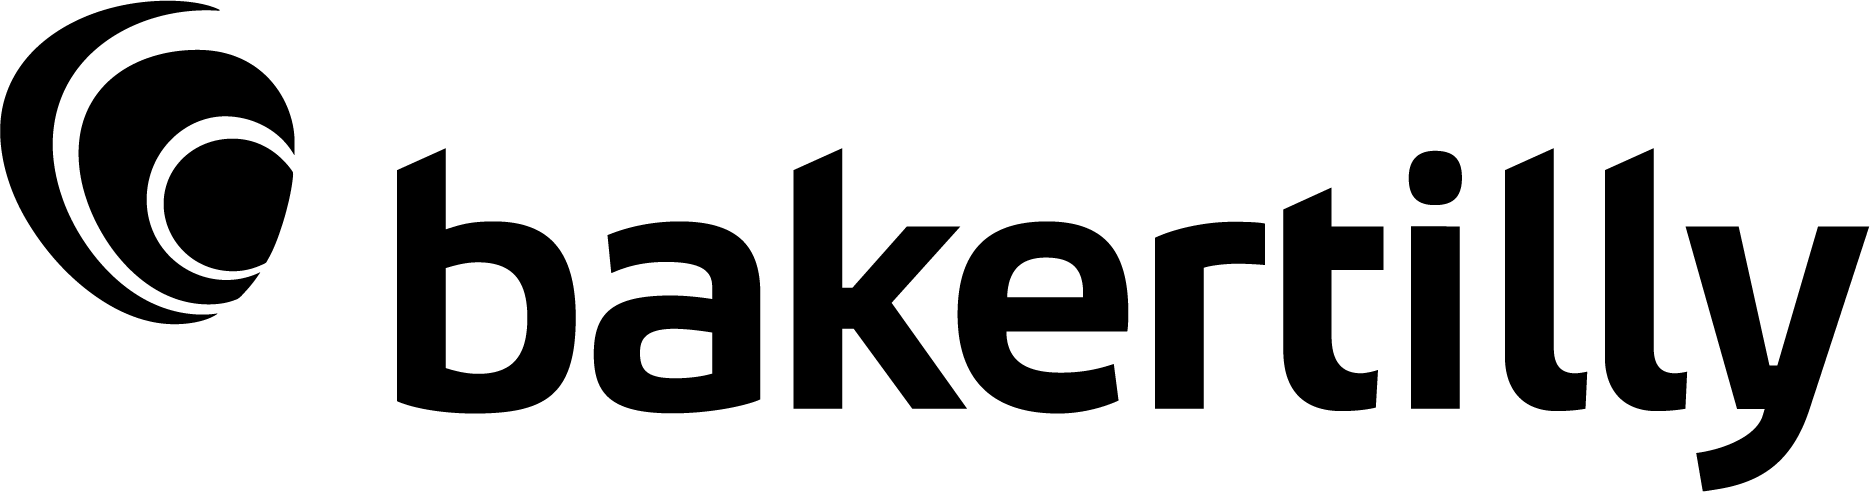 5e288484eab8d.png